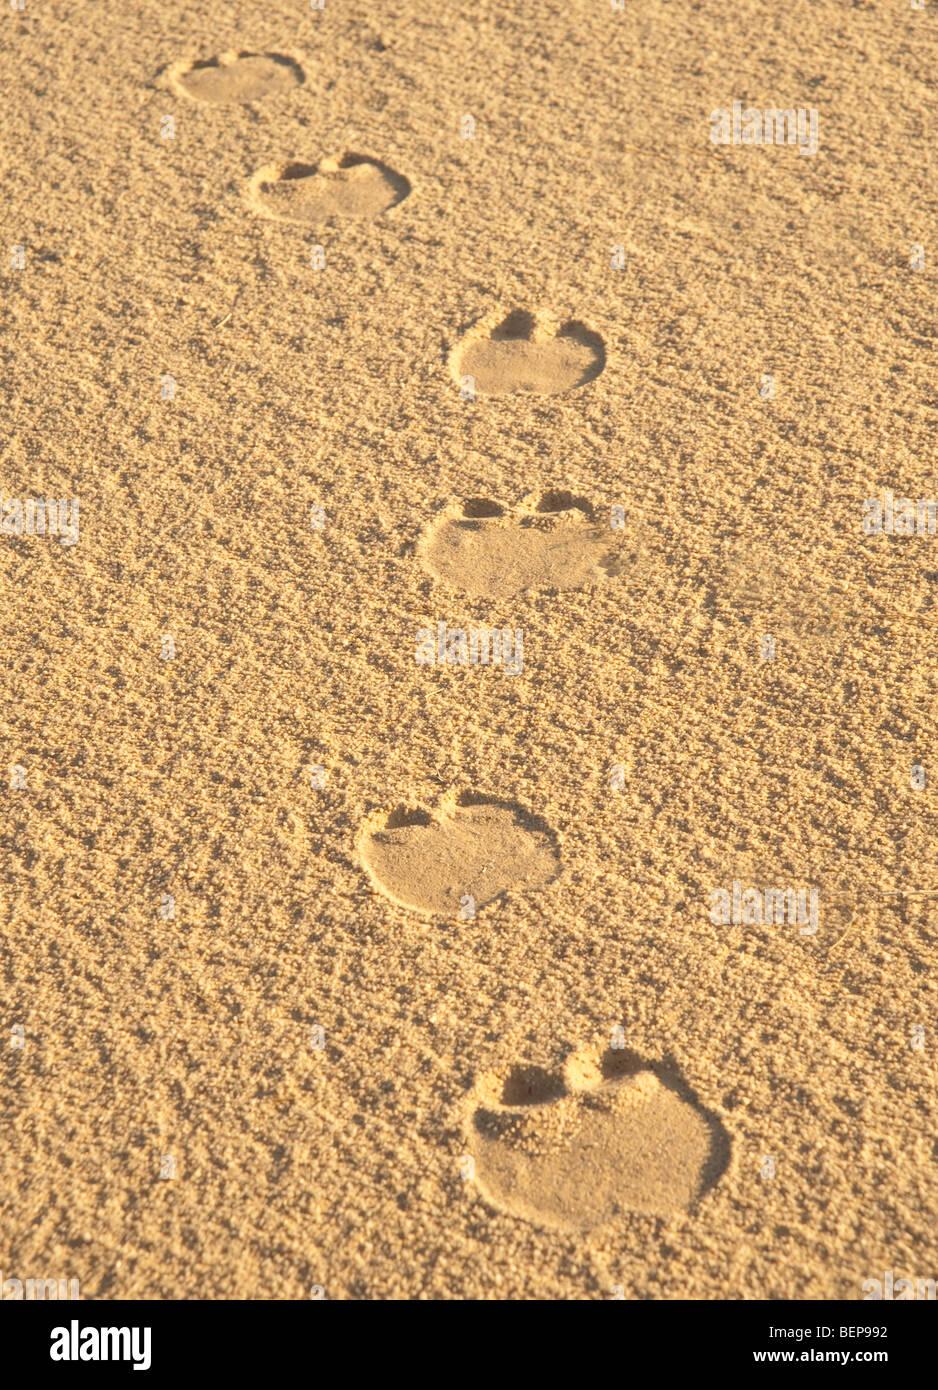 Camel footprints in the desert sand - Stock Image